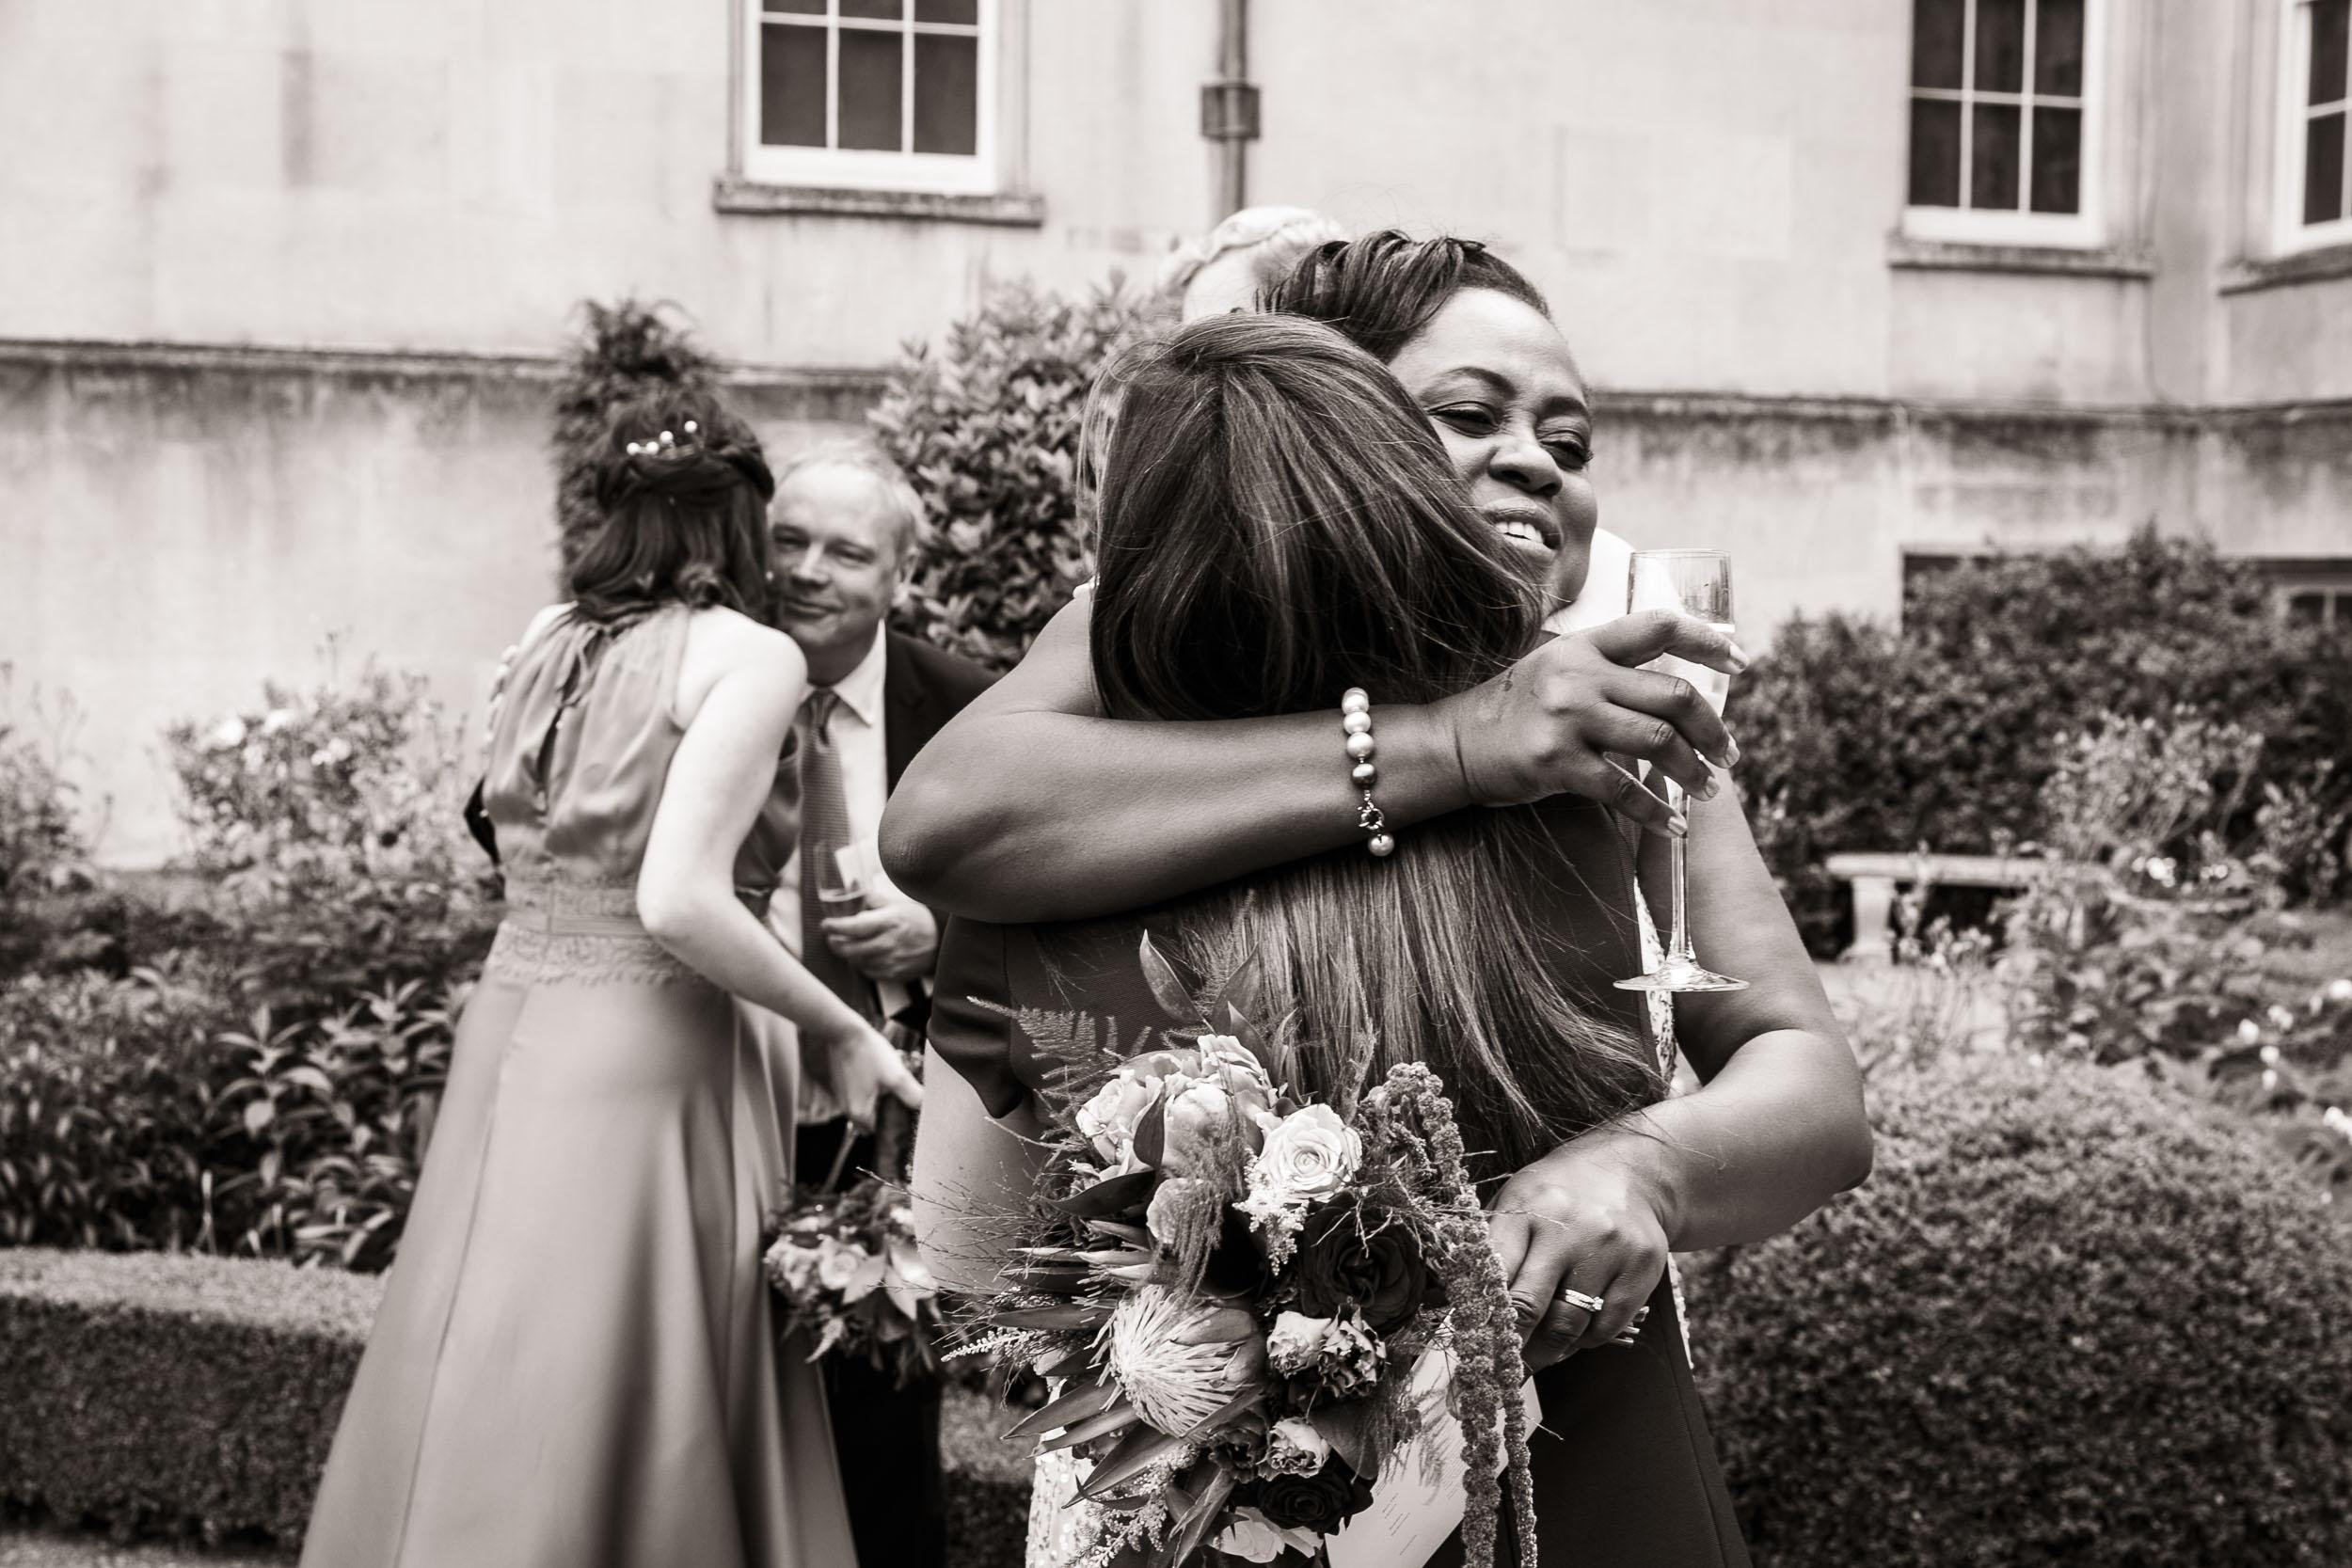 syon-house-wedding-photographer-london 085.jpg